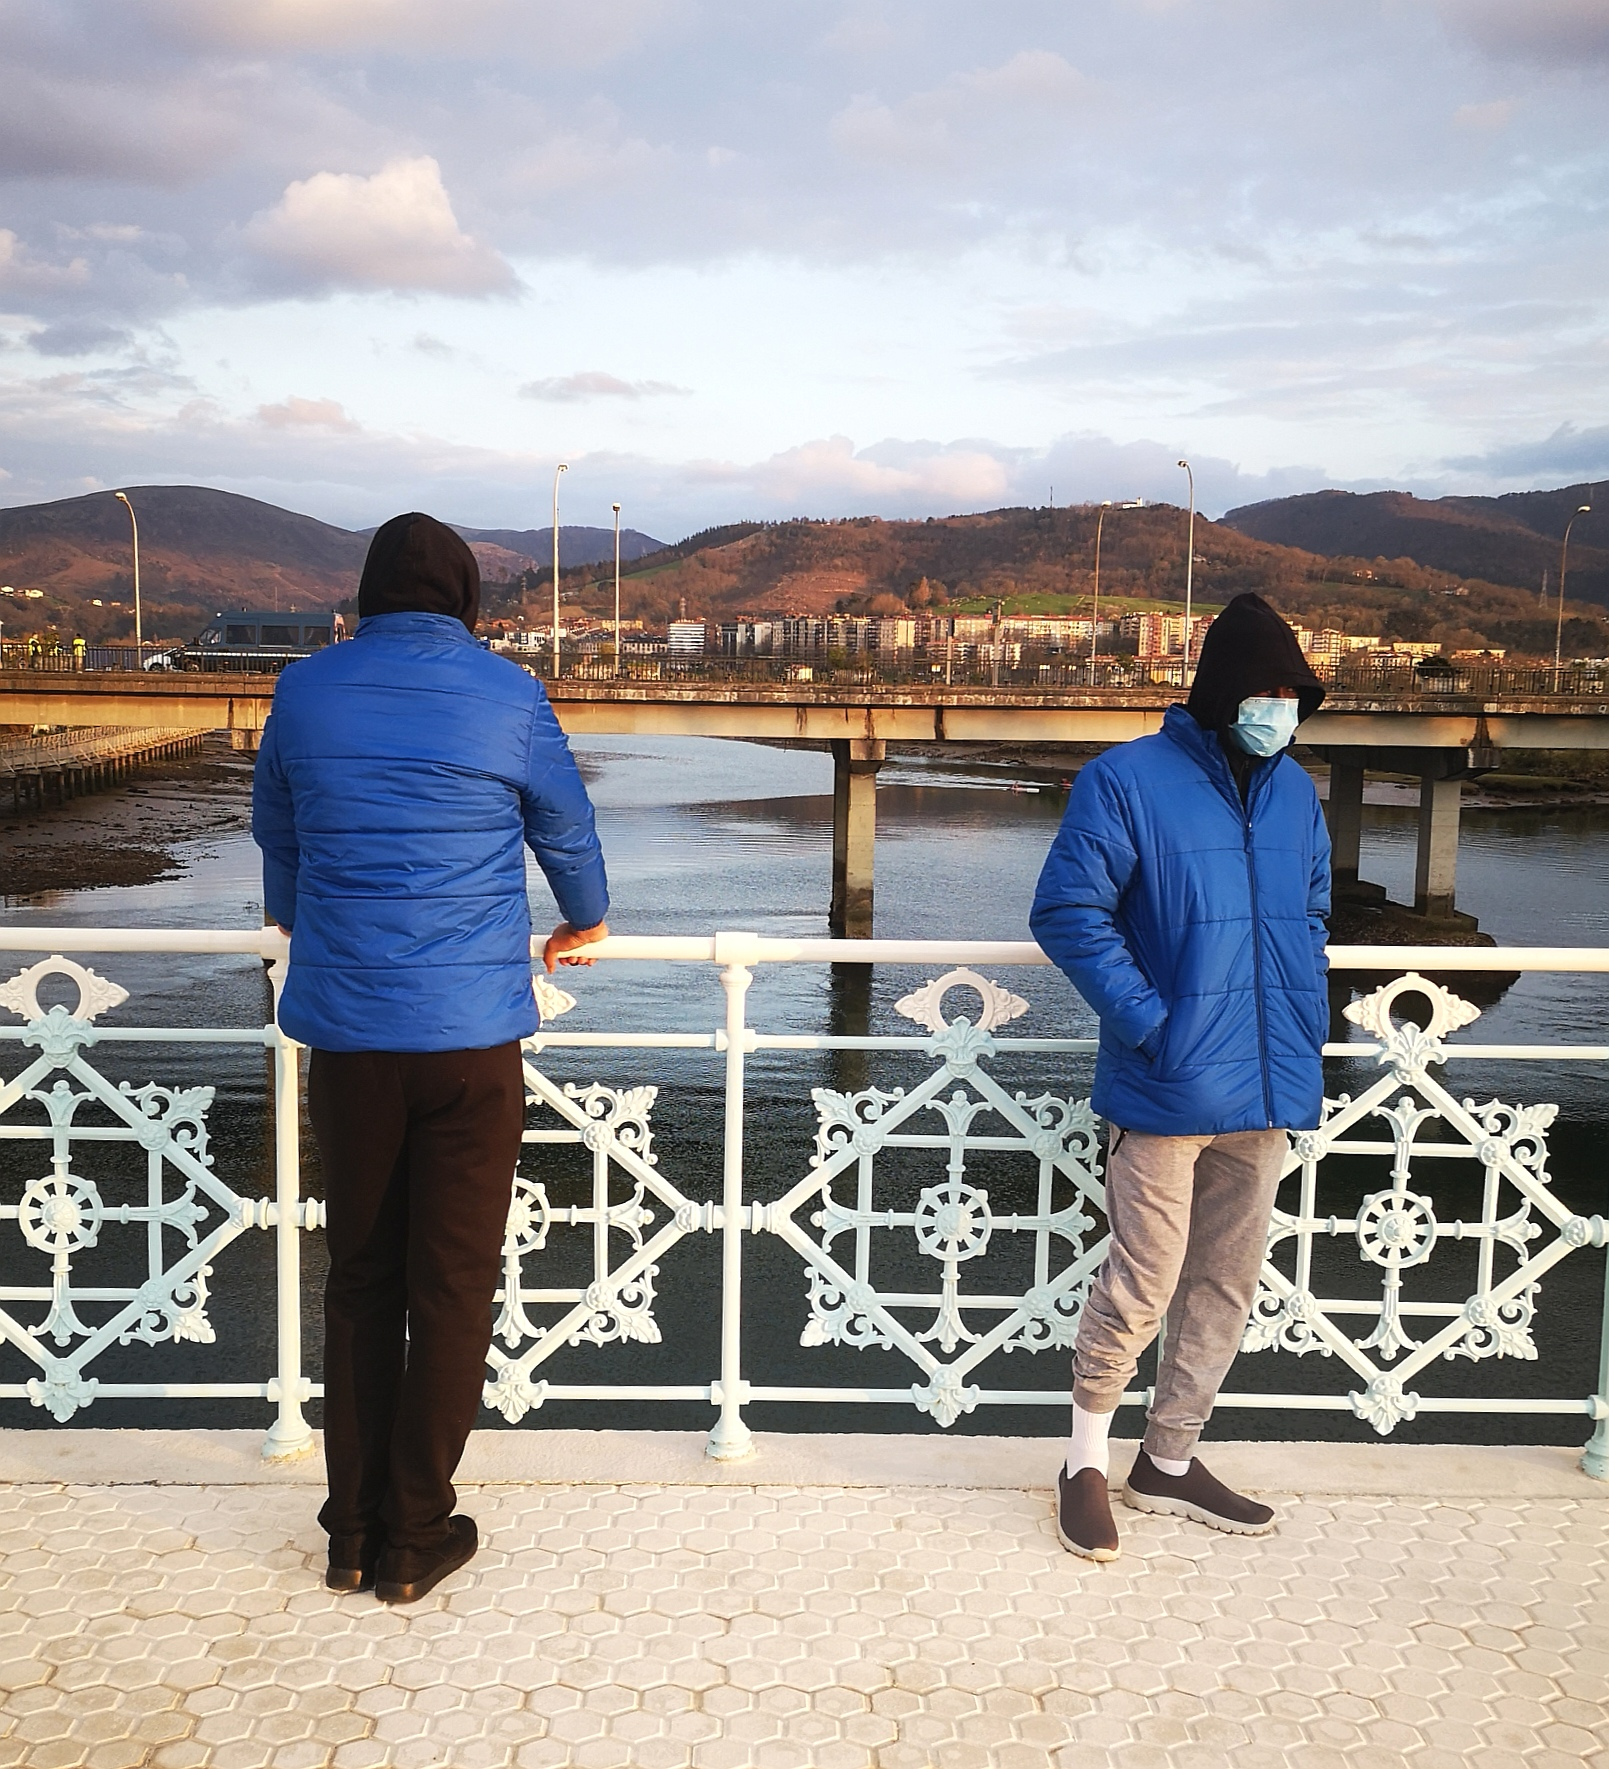 Imagen de archivo. Migrantes en Irun a la espera de pasar a Francia en marzo. Foto: Jon Pagola